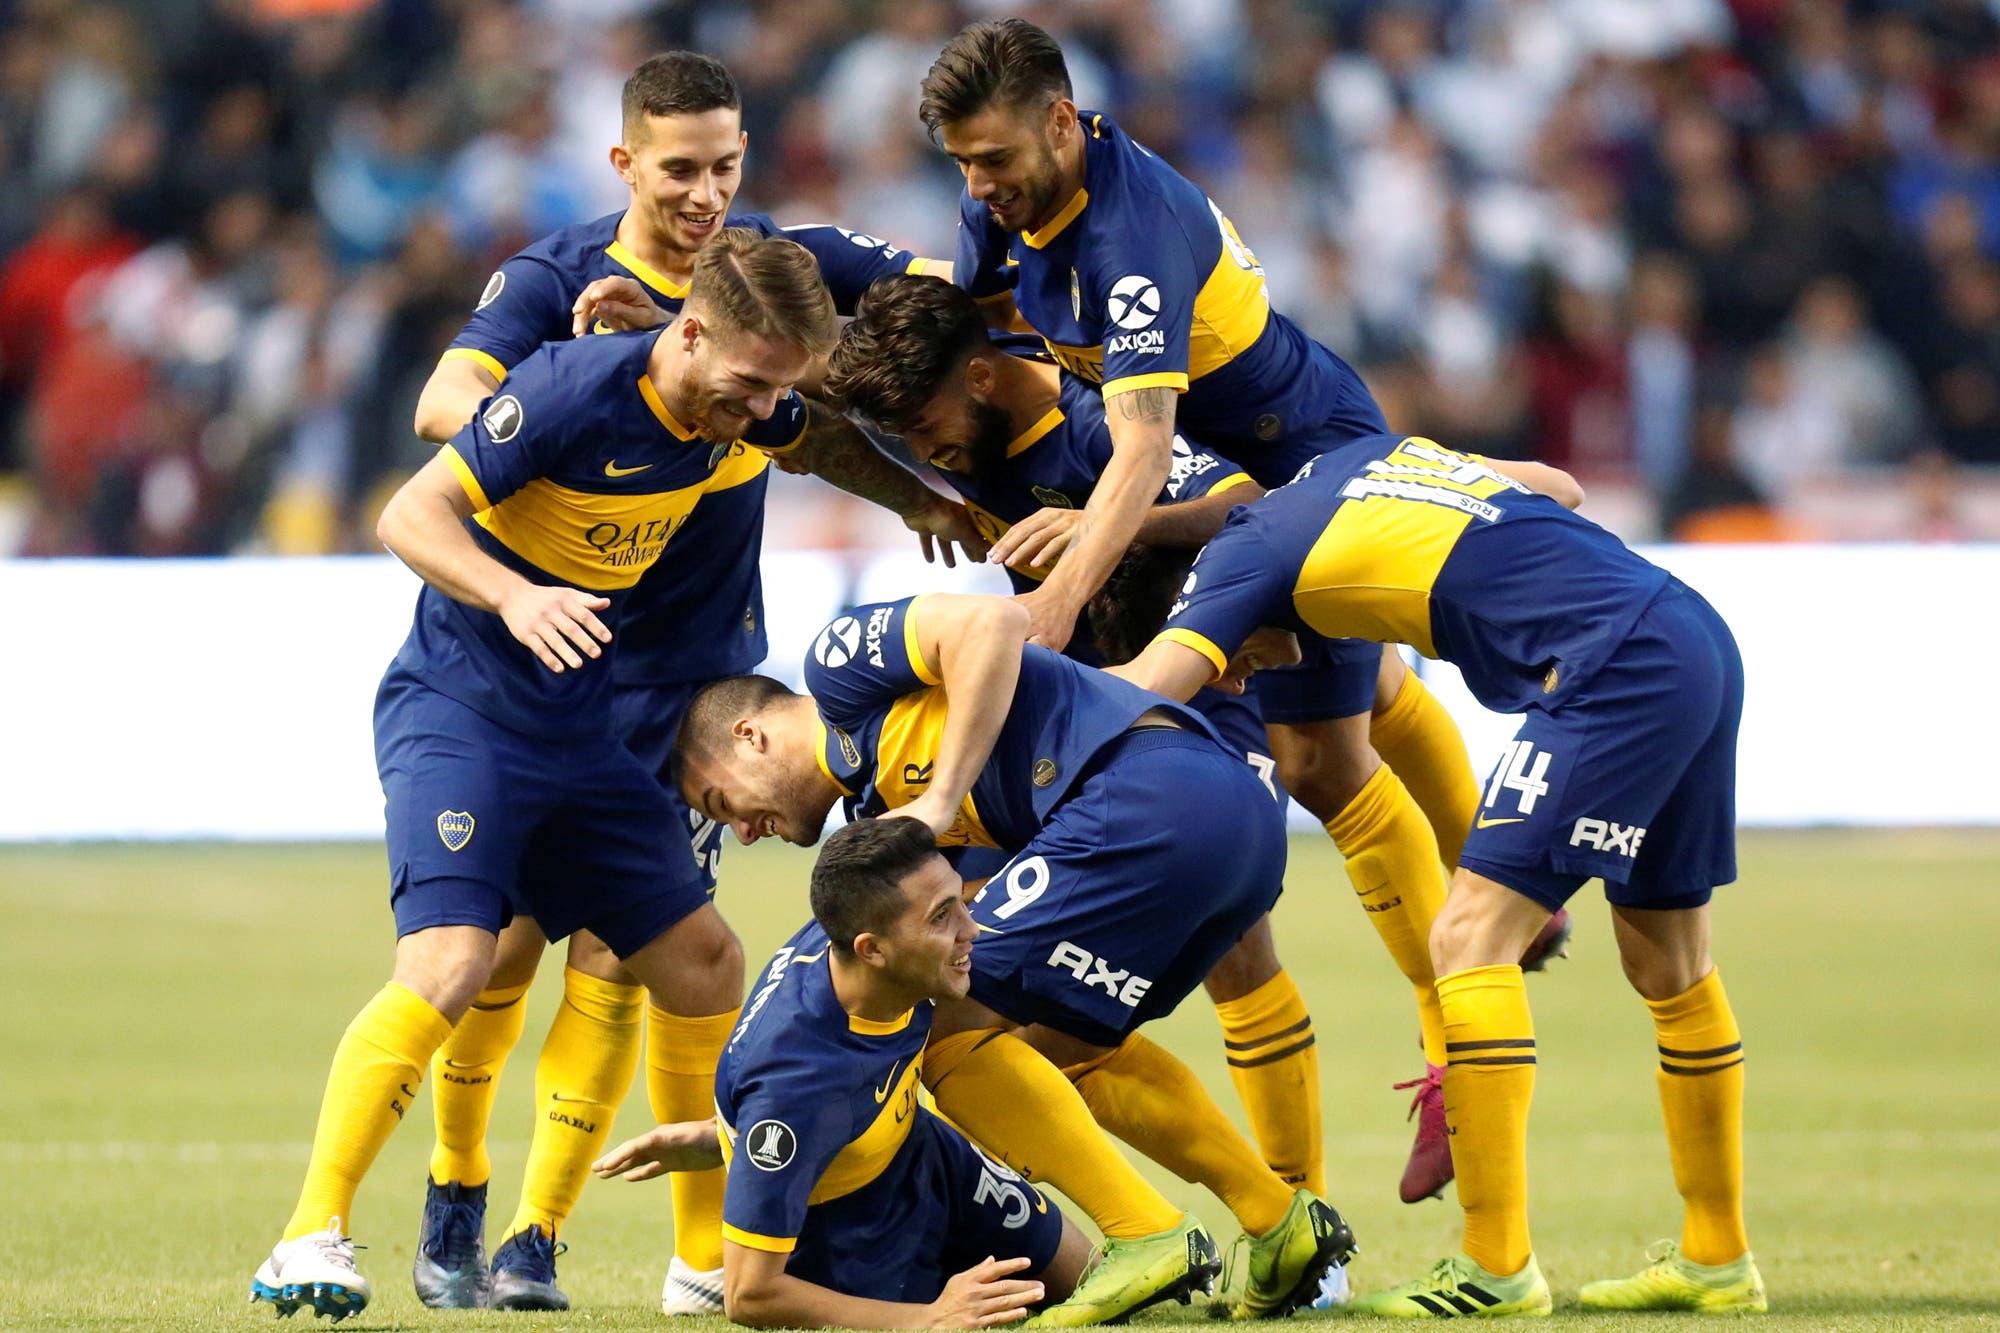 Liga de Quito-Boca, por la Copa Libertadores: el Xeneize gana 2-0 en la altura